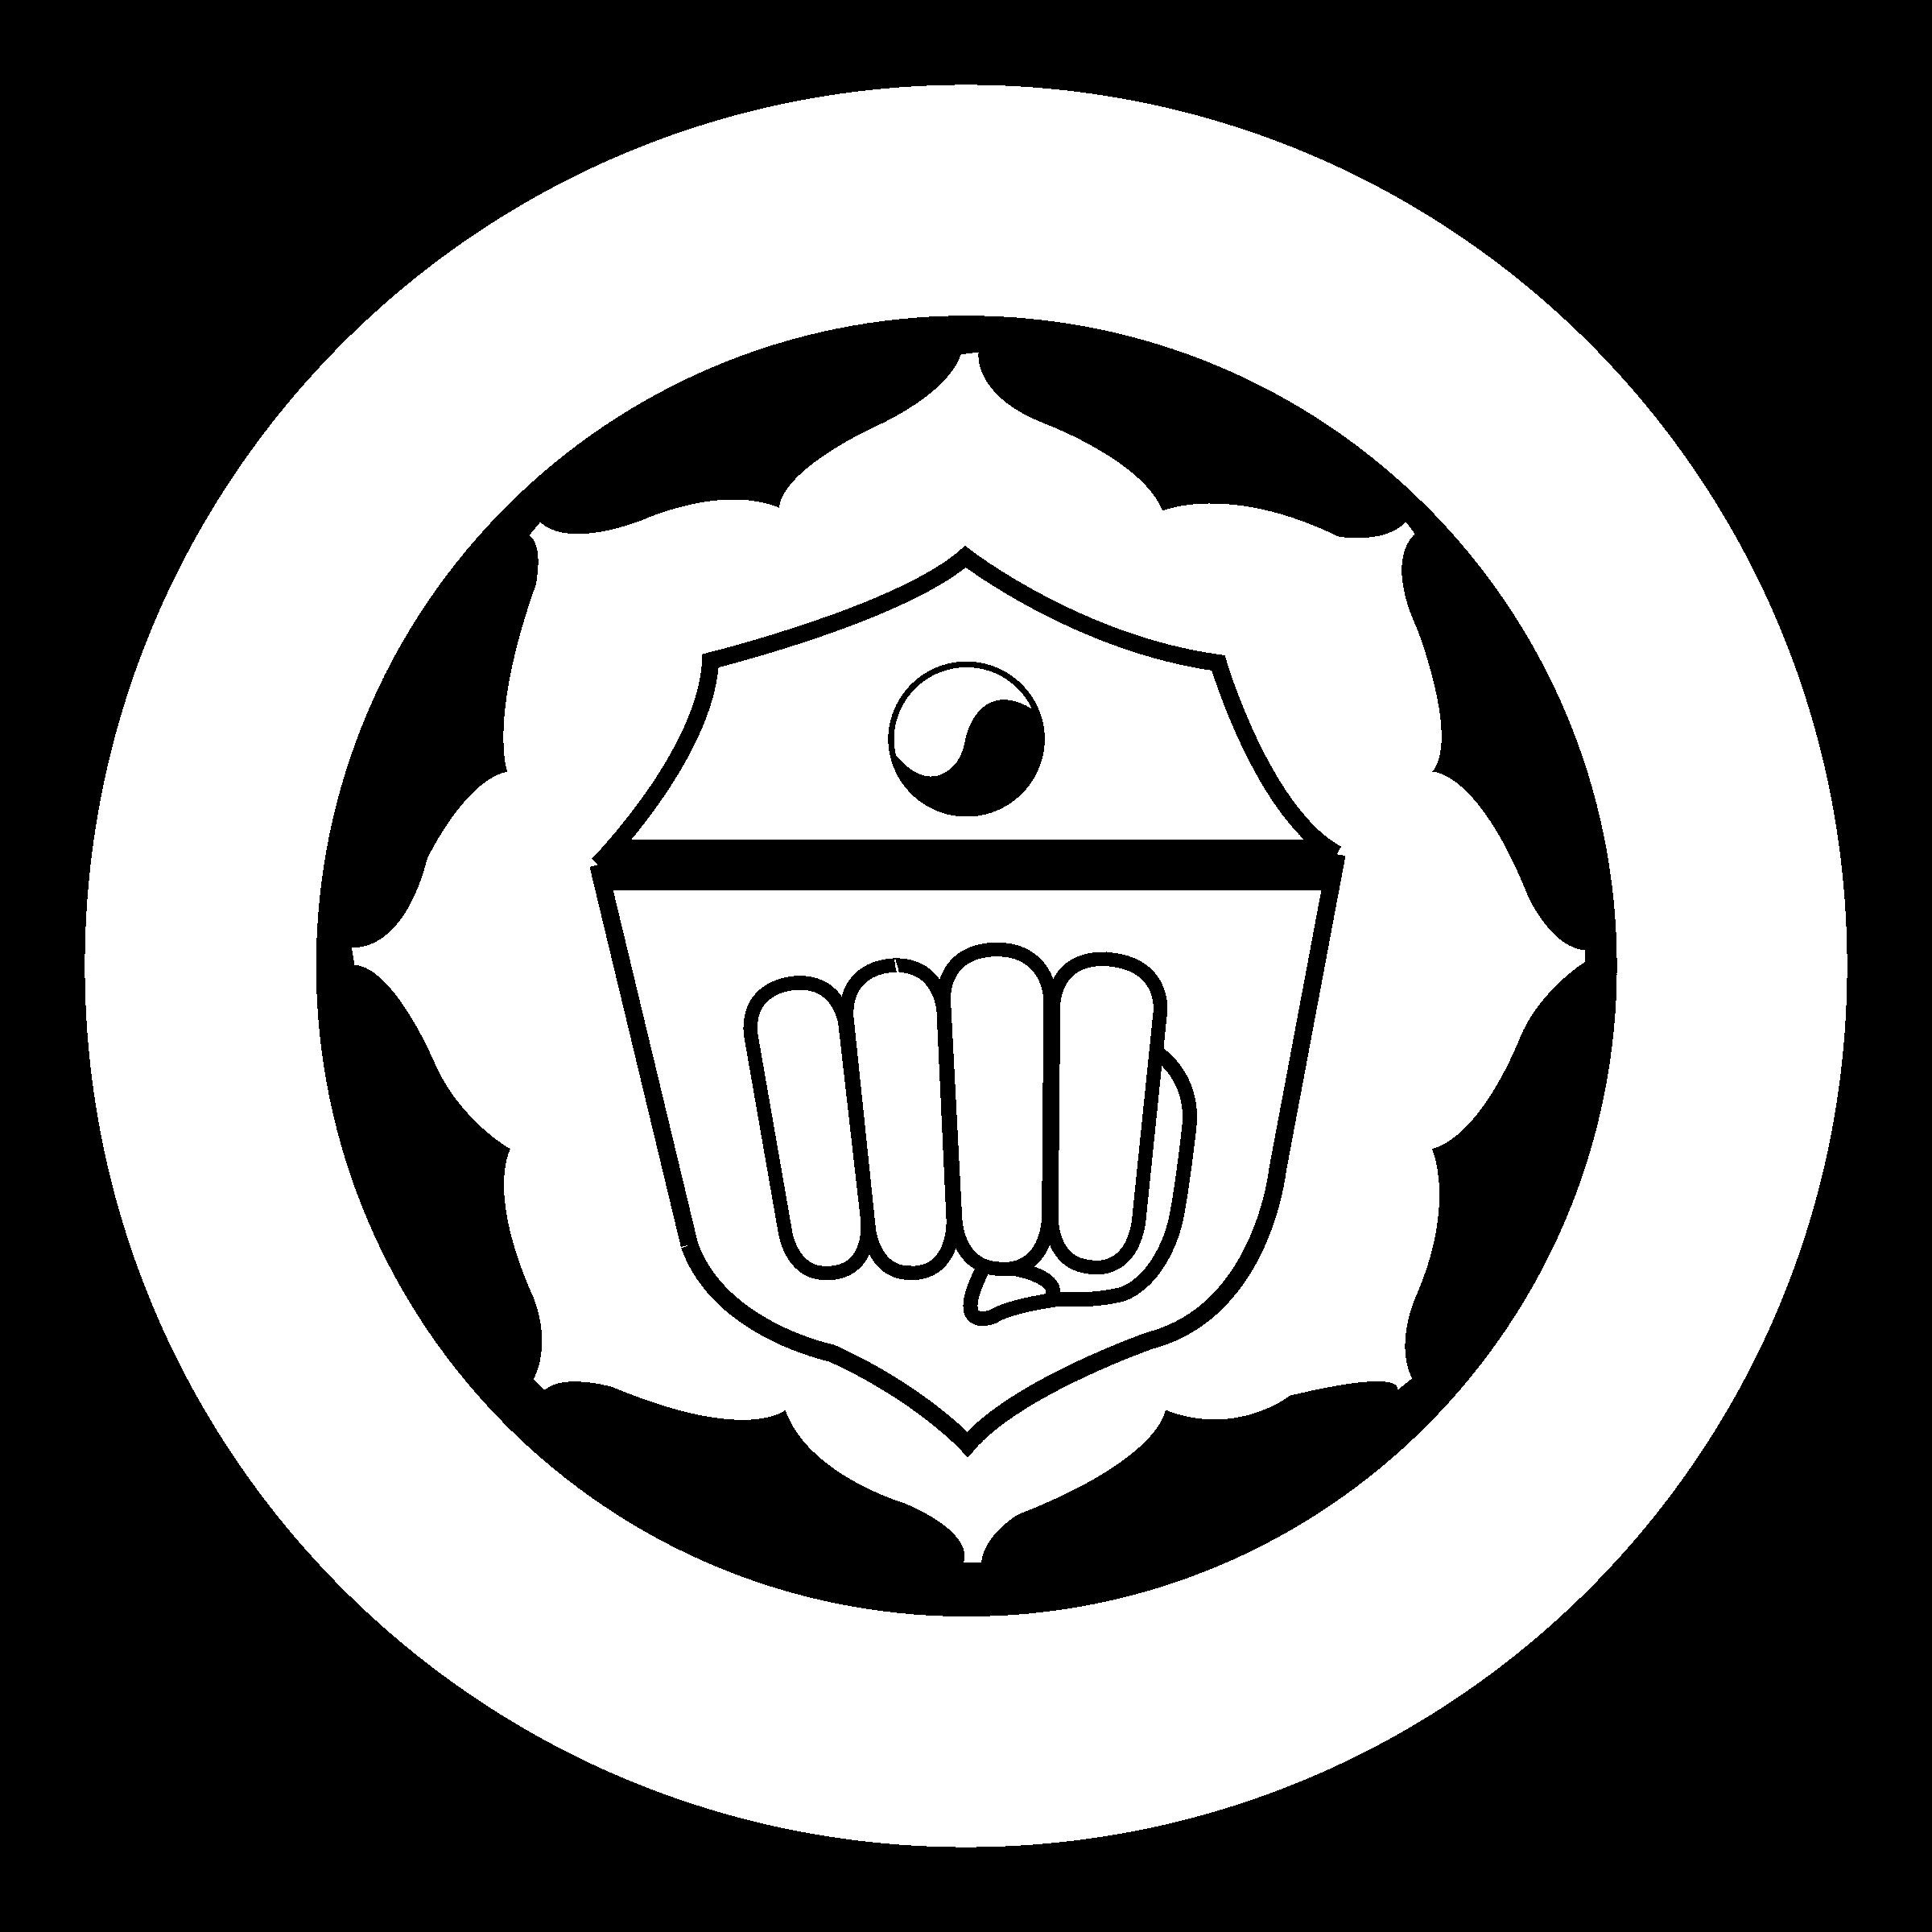 The Korea Taekwondo Association Logo Png Transparent Svg Vector